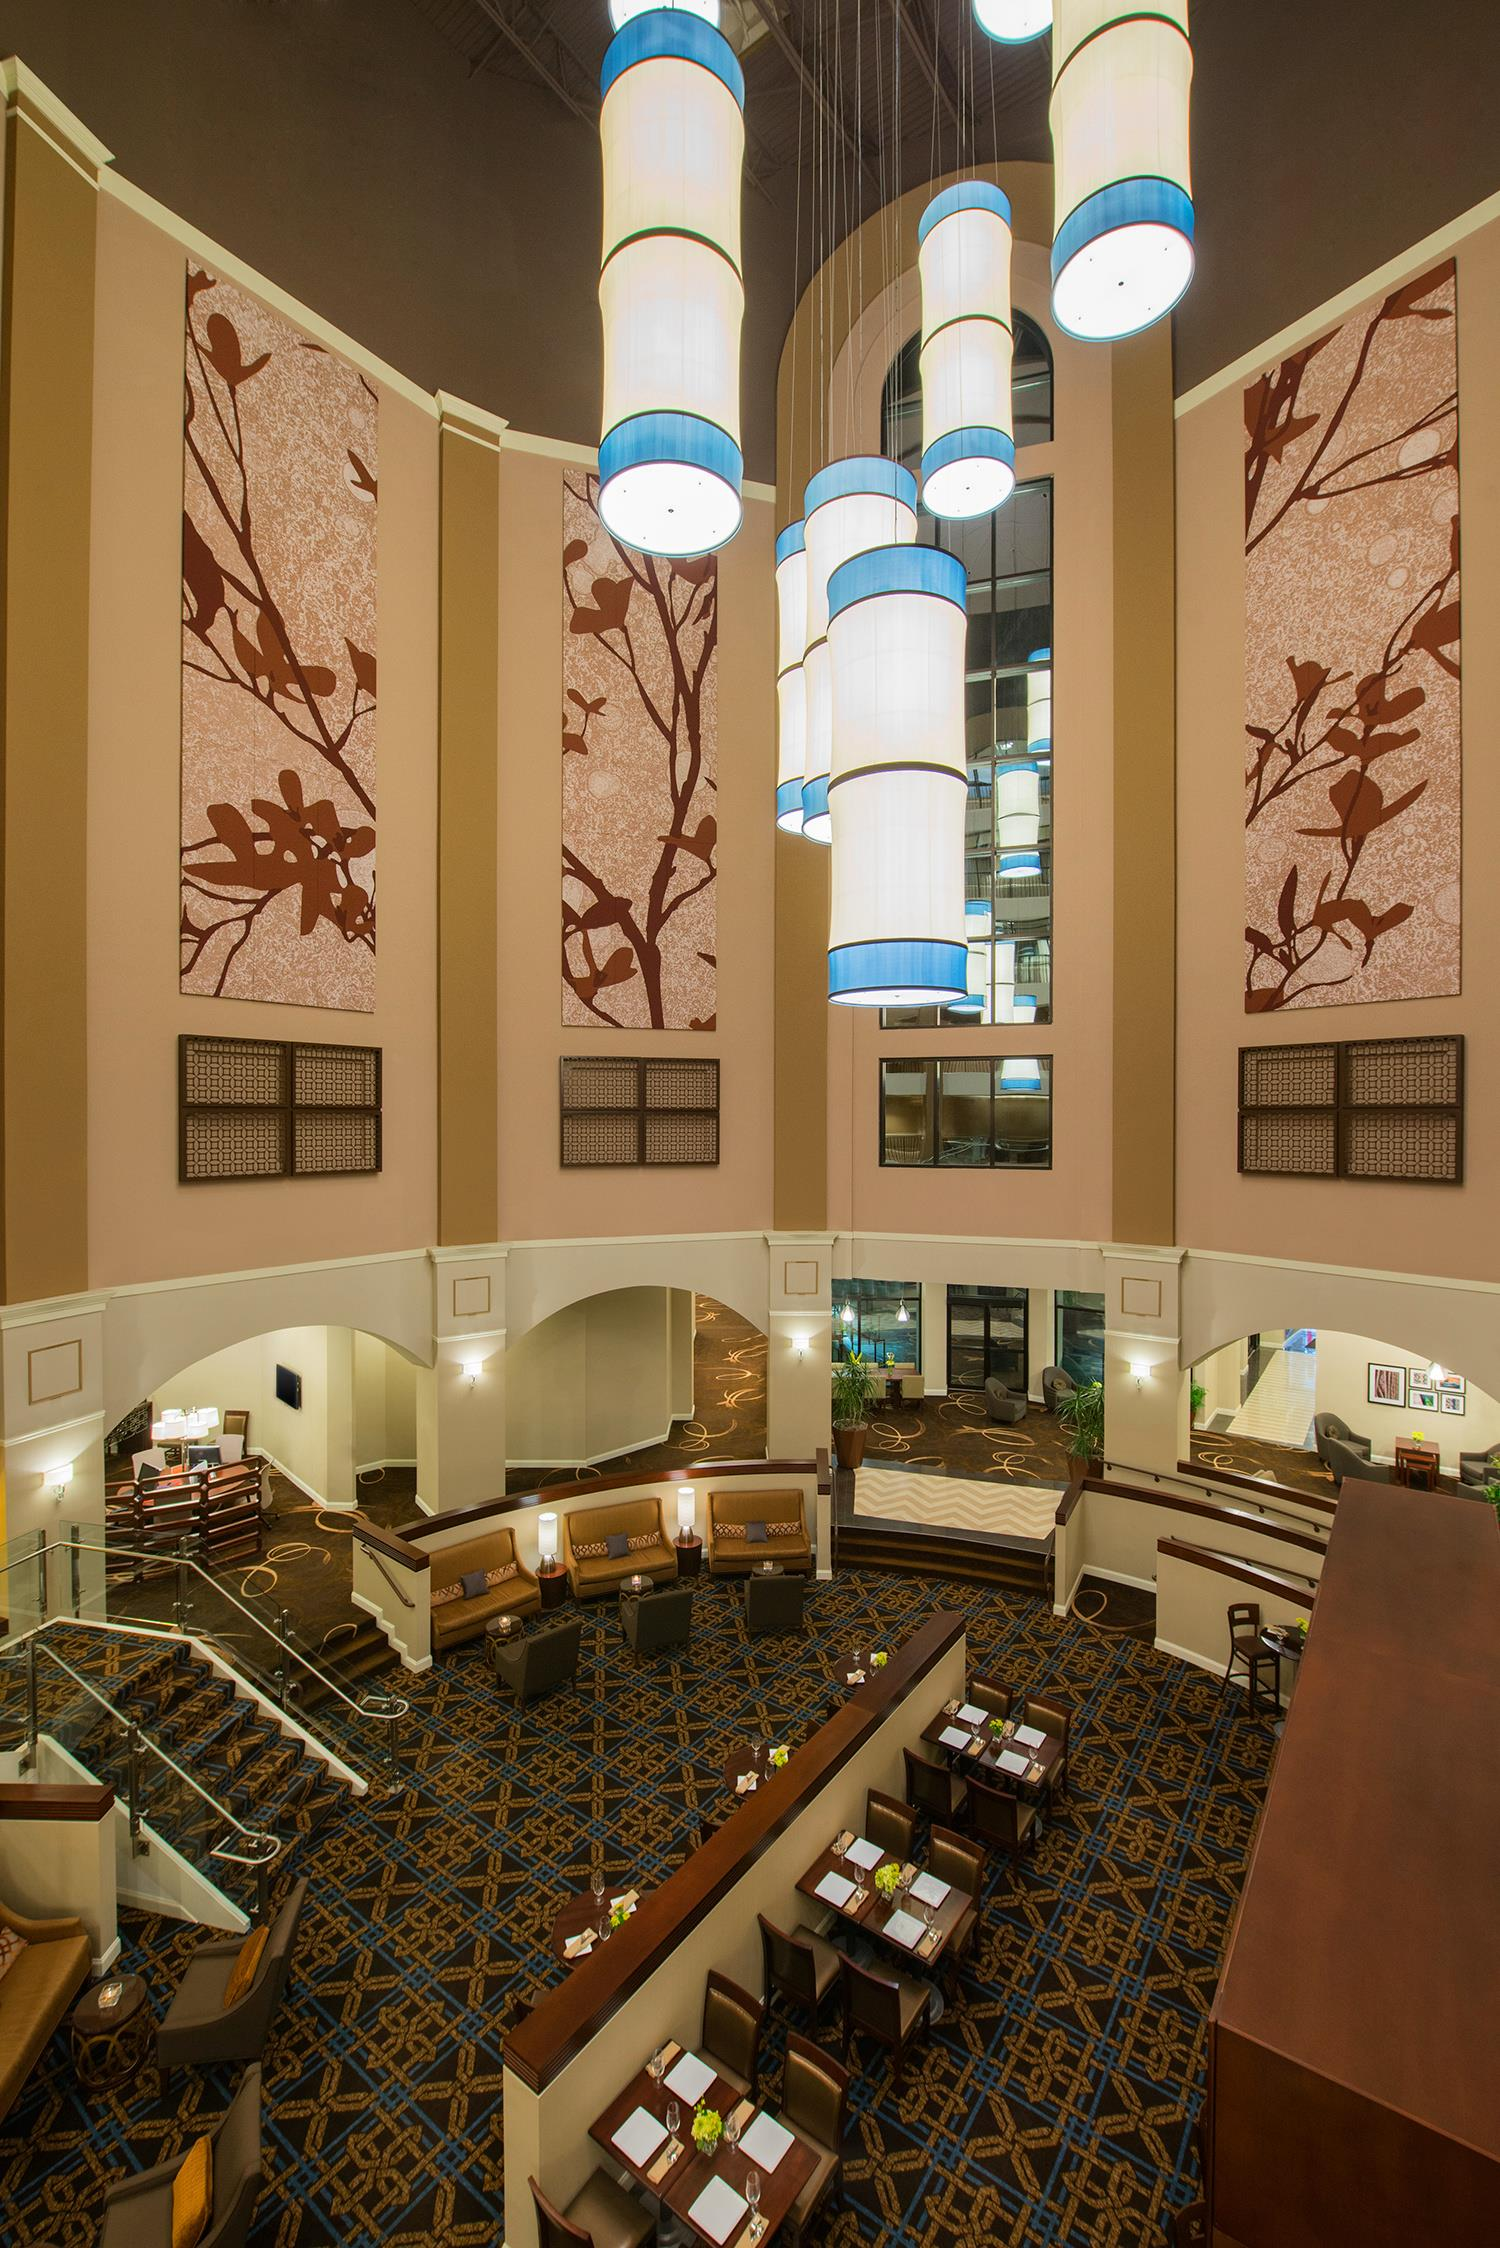 Sheraton Wilmington South Hotel image 25